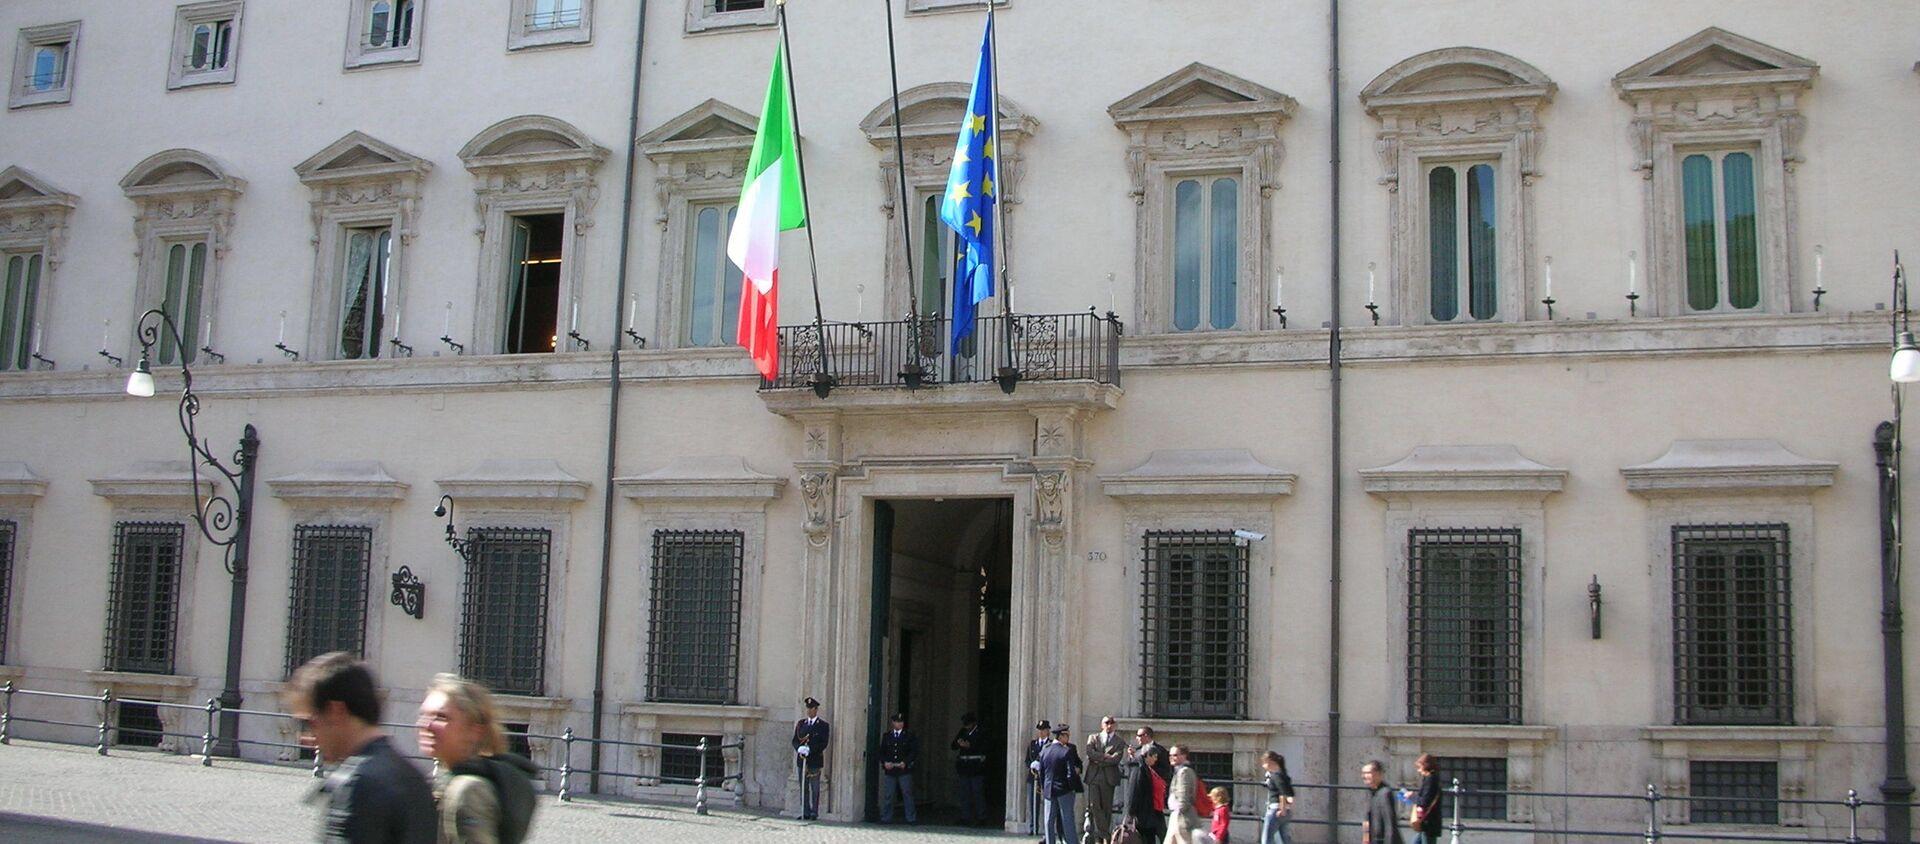 Il Palazzo Chigi - Sputnik Italia, 1920, 22.04.2021